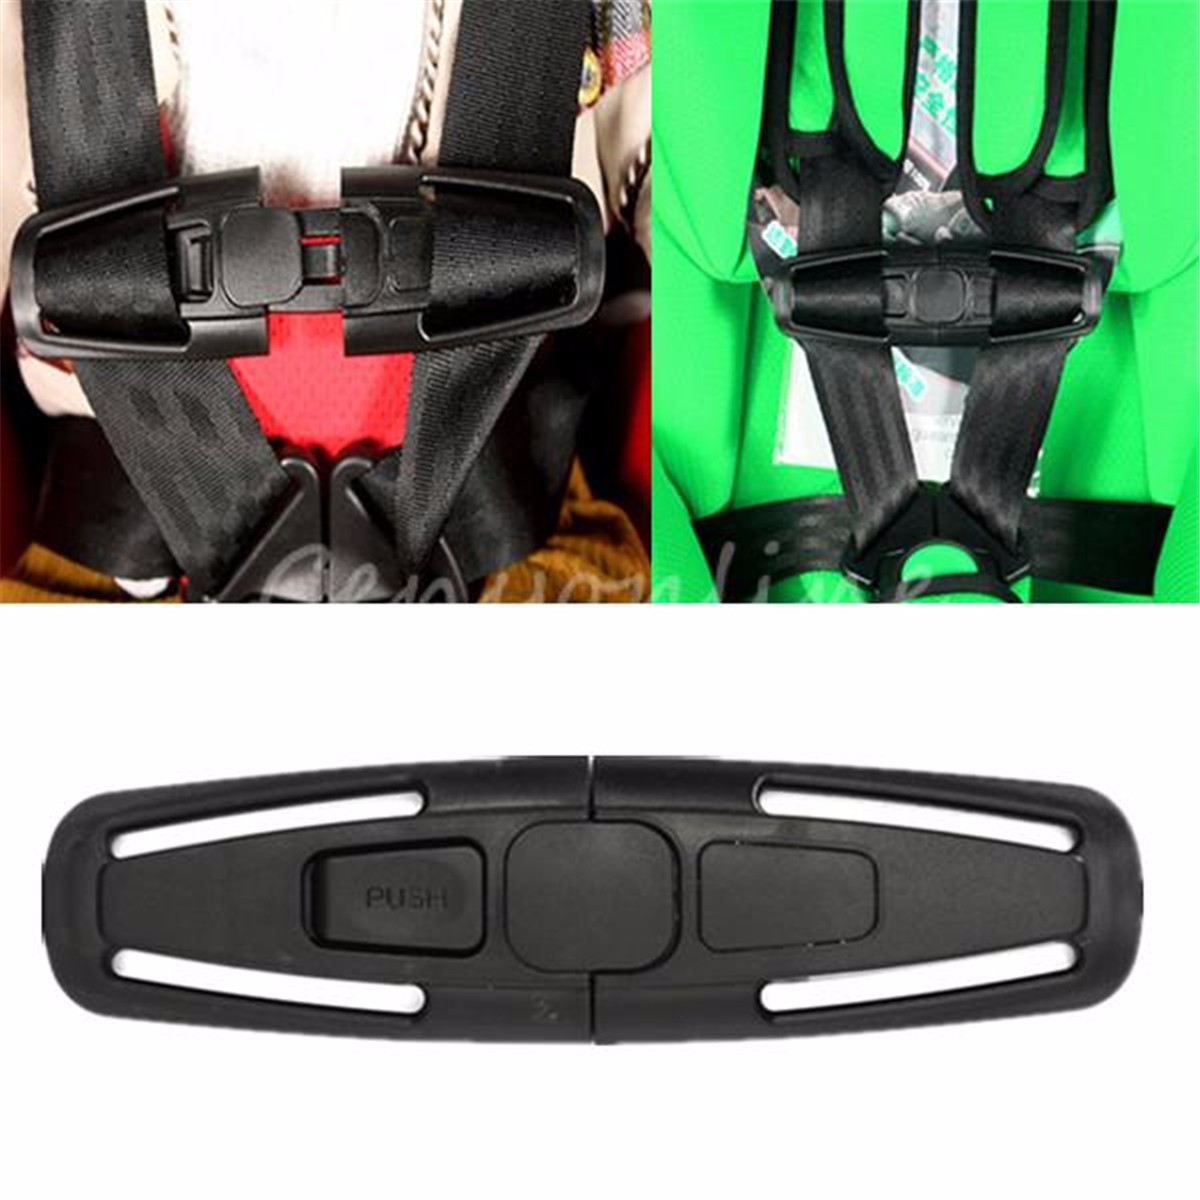 Car Baby Safety Seat Strap Belt Harness Chest Child Clip Buckle Latch Black Nylon 14.5 x 4cm